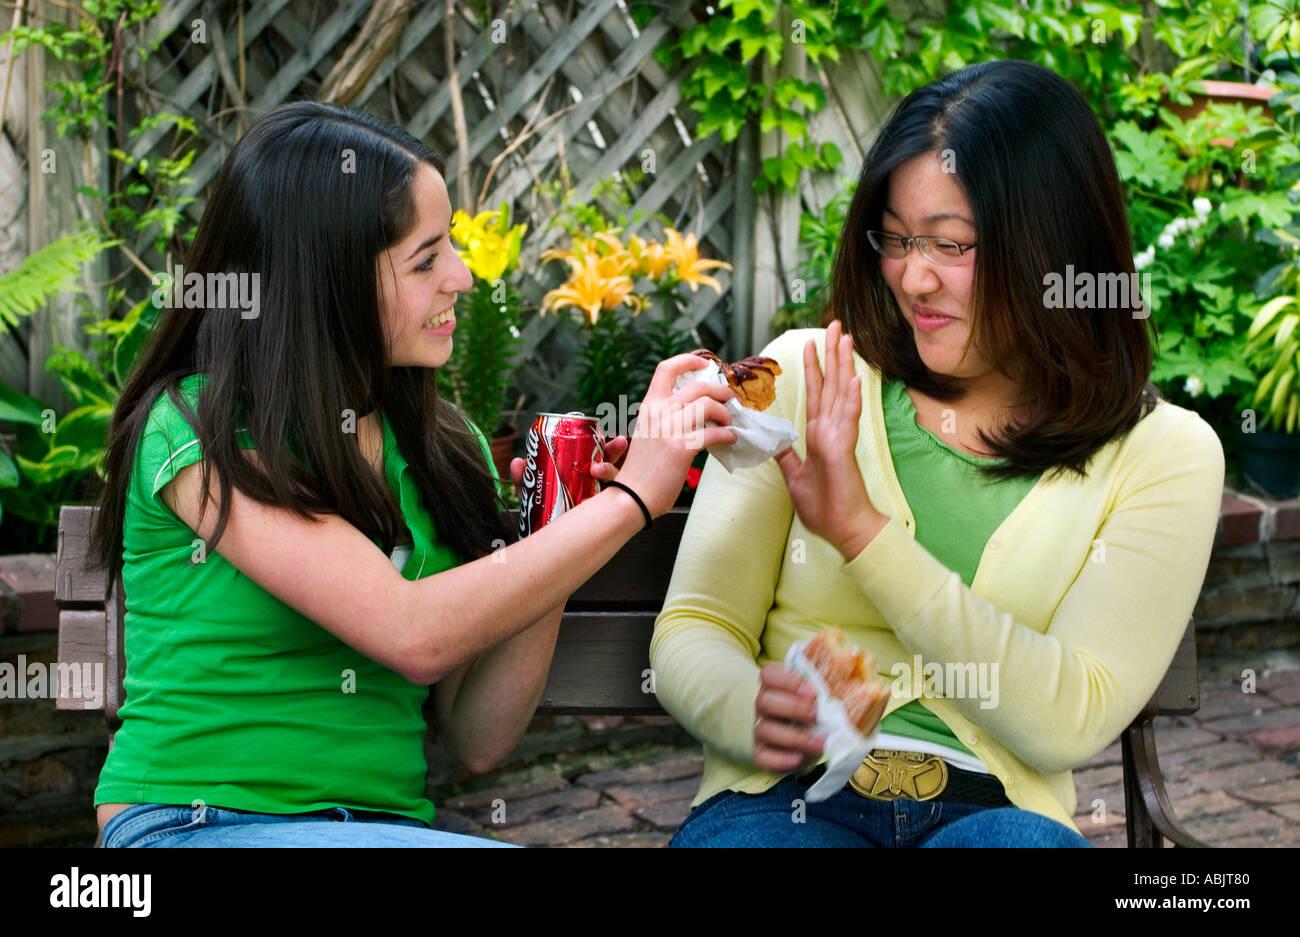 Hispanic American and Korean American girls eating junk food Chicago IL - Stock Image